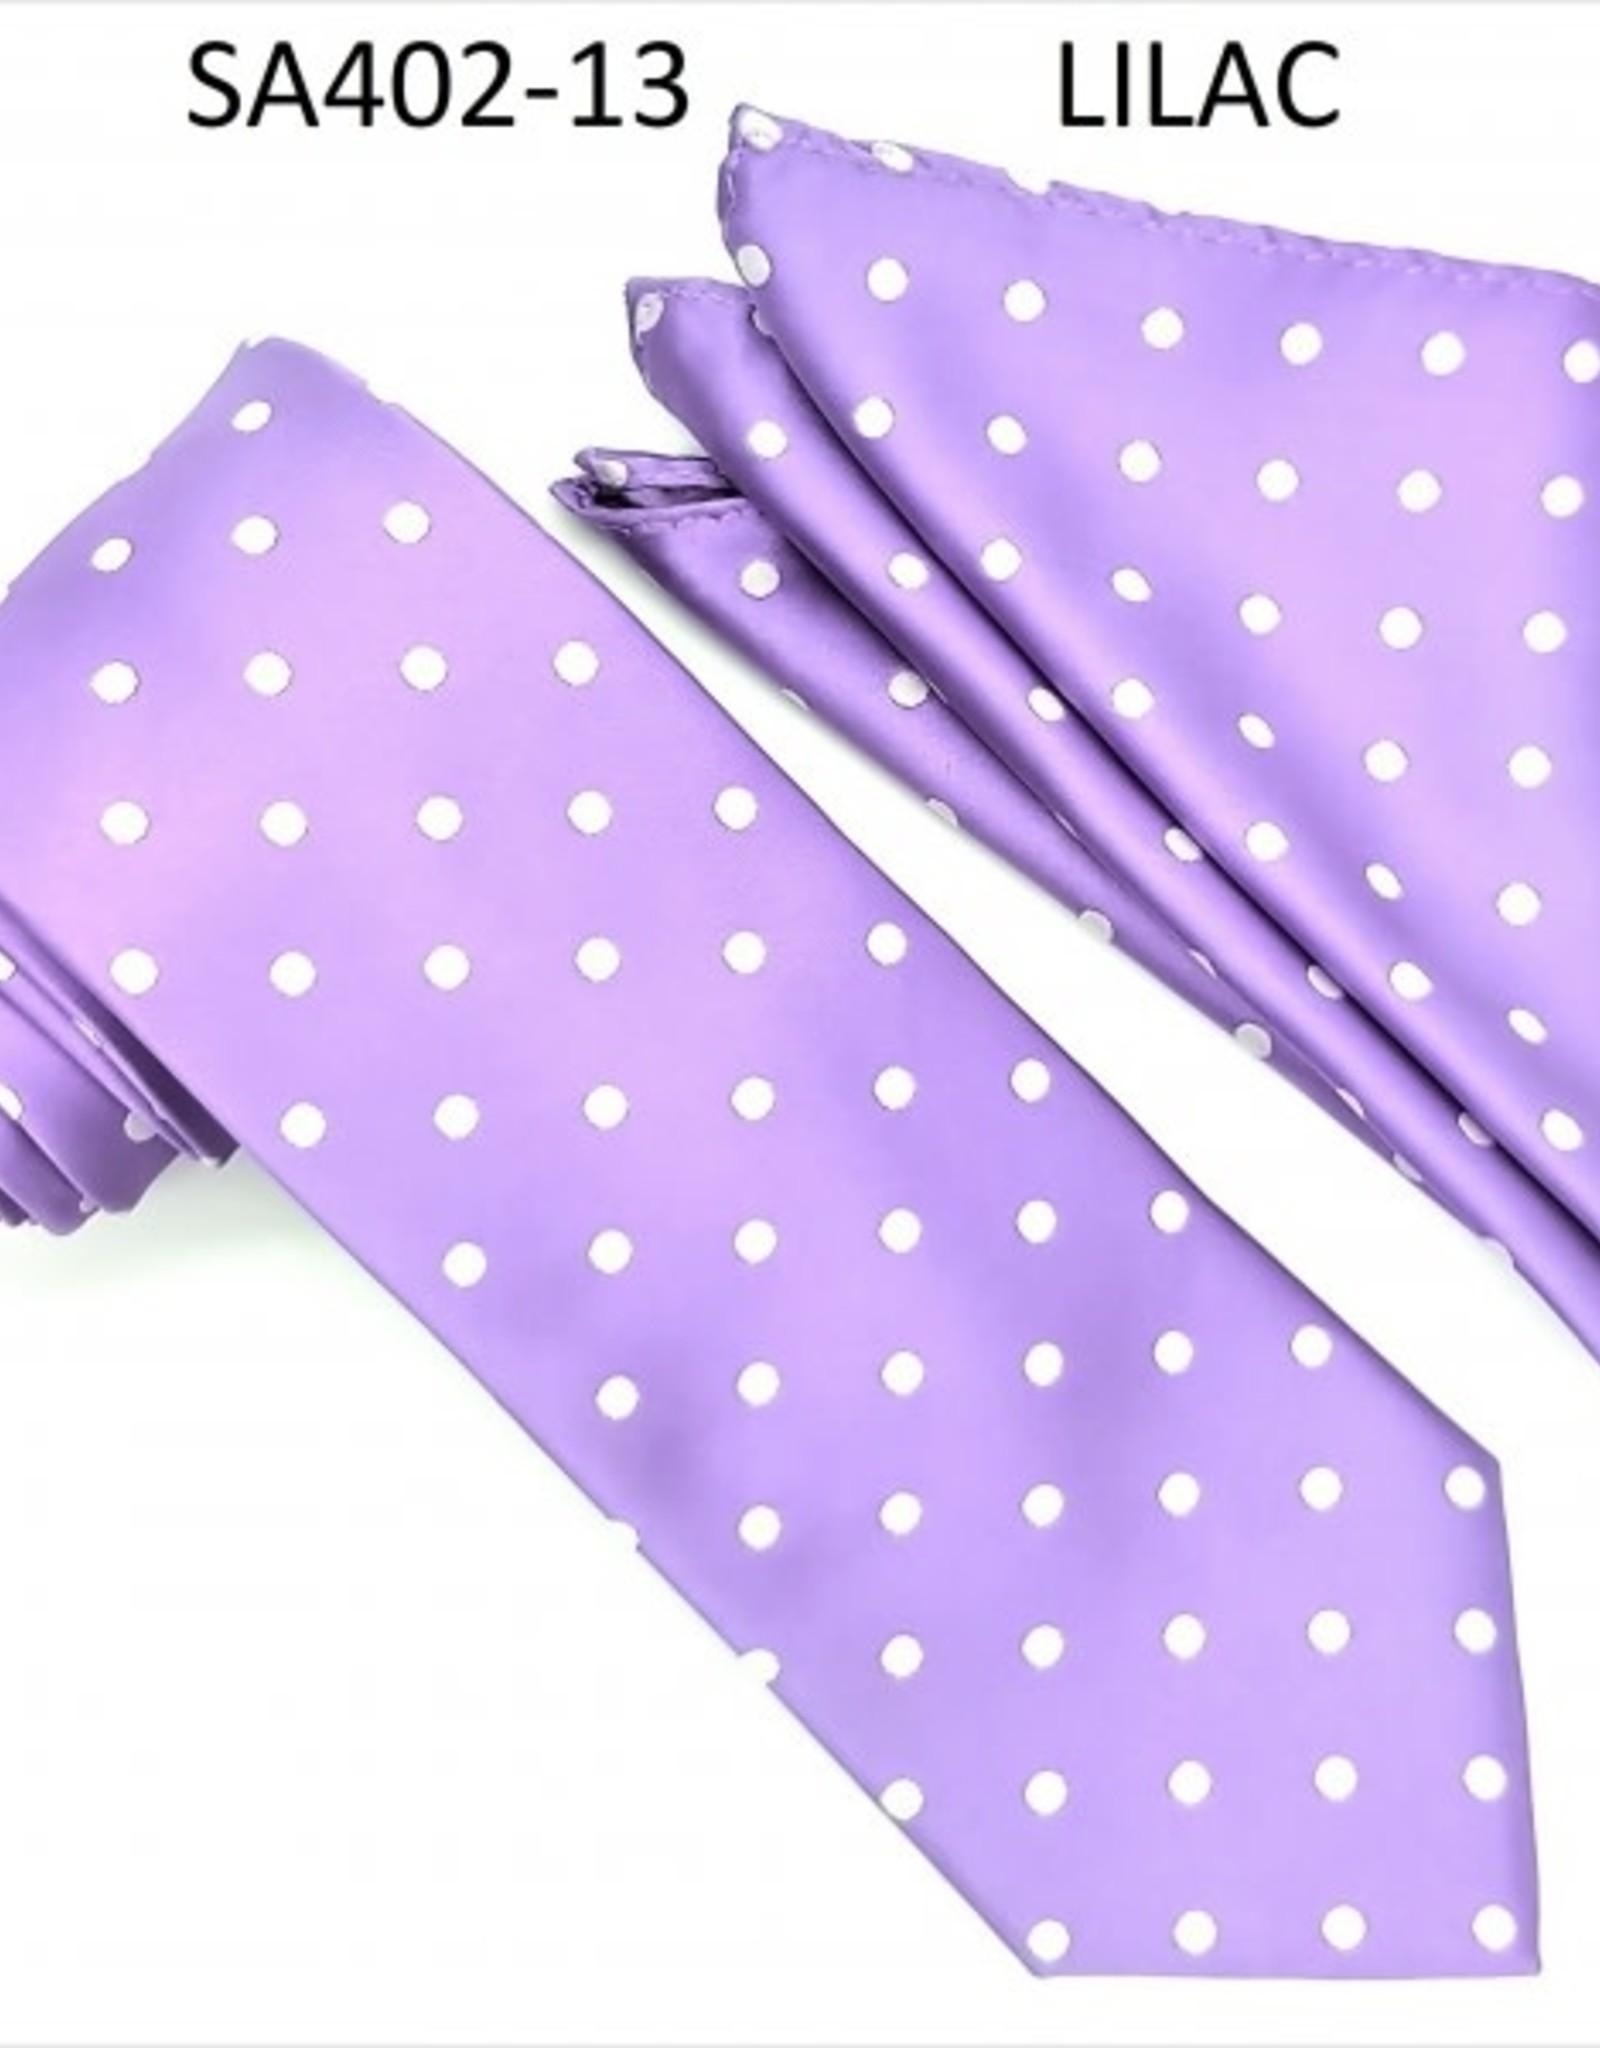 Stacy Adams Tie Stacy Adams Reg PolkaDot sa402-13 Lilac